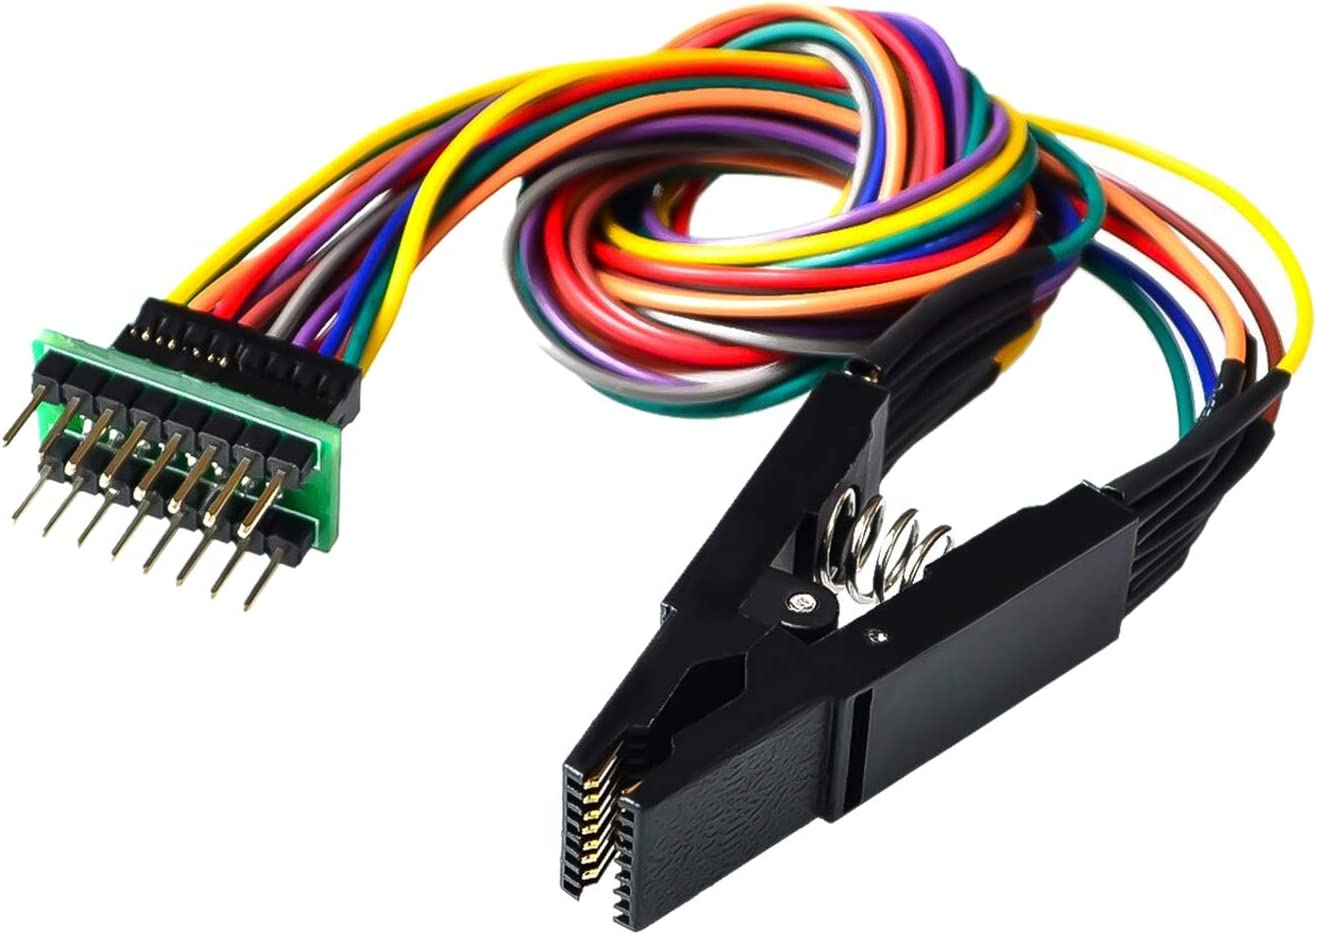 Black Programmer Testing Clip SOP8 Pin SOIC8 DIP8 IC Test Clamp` YJ